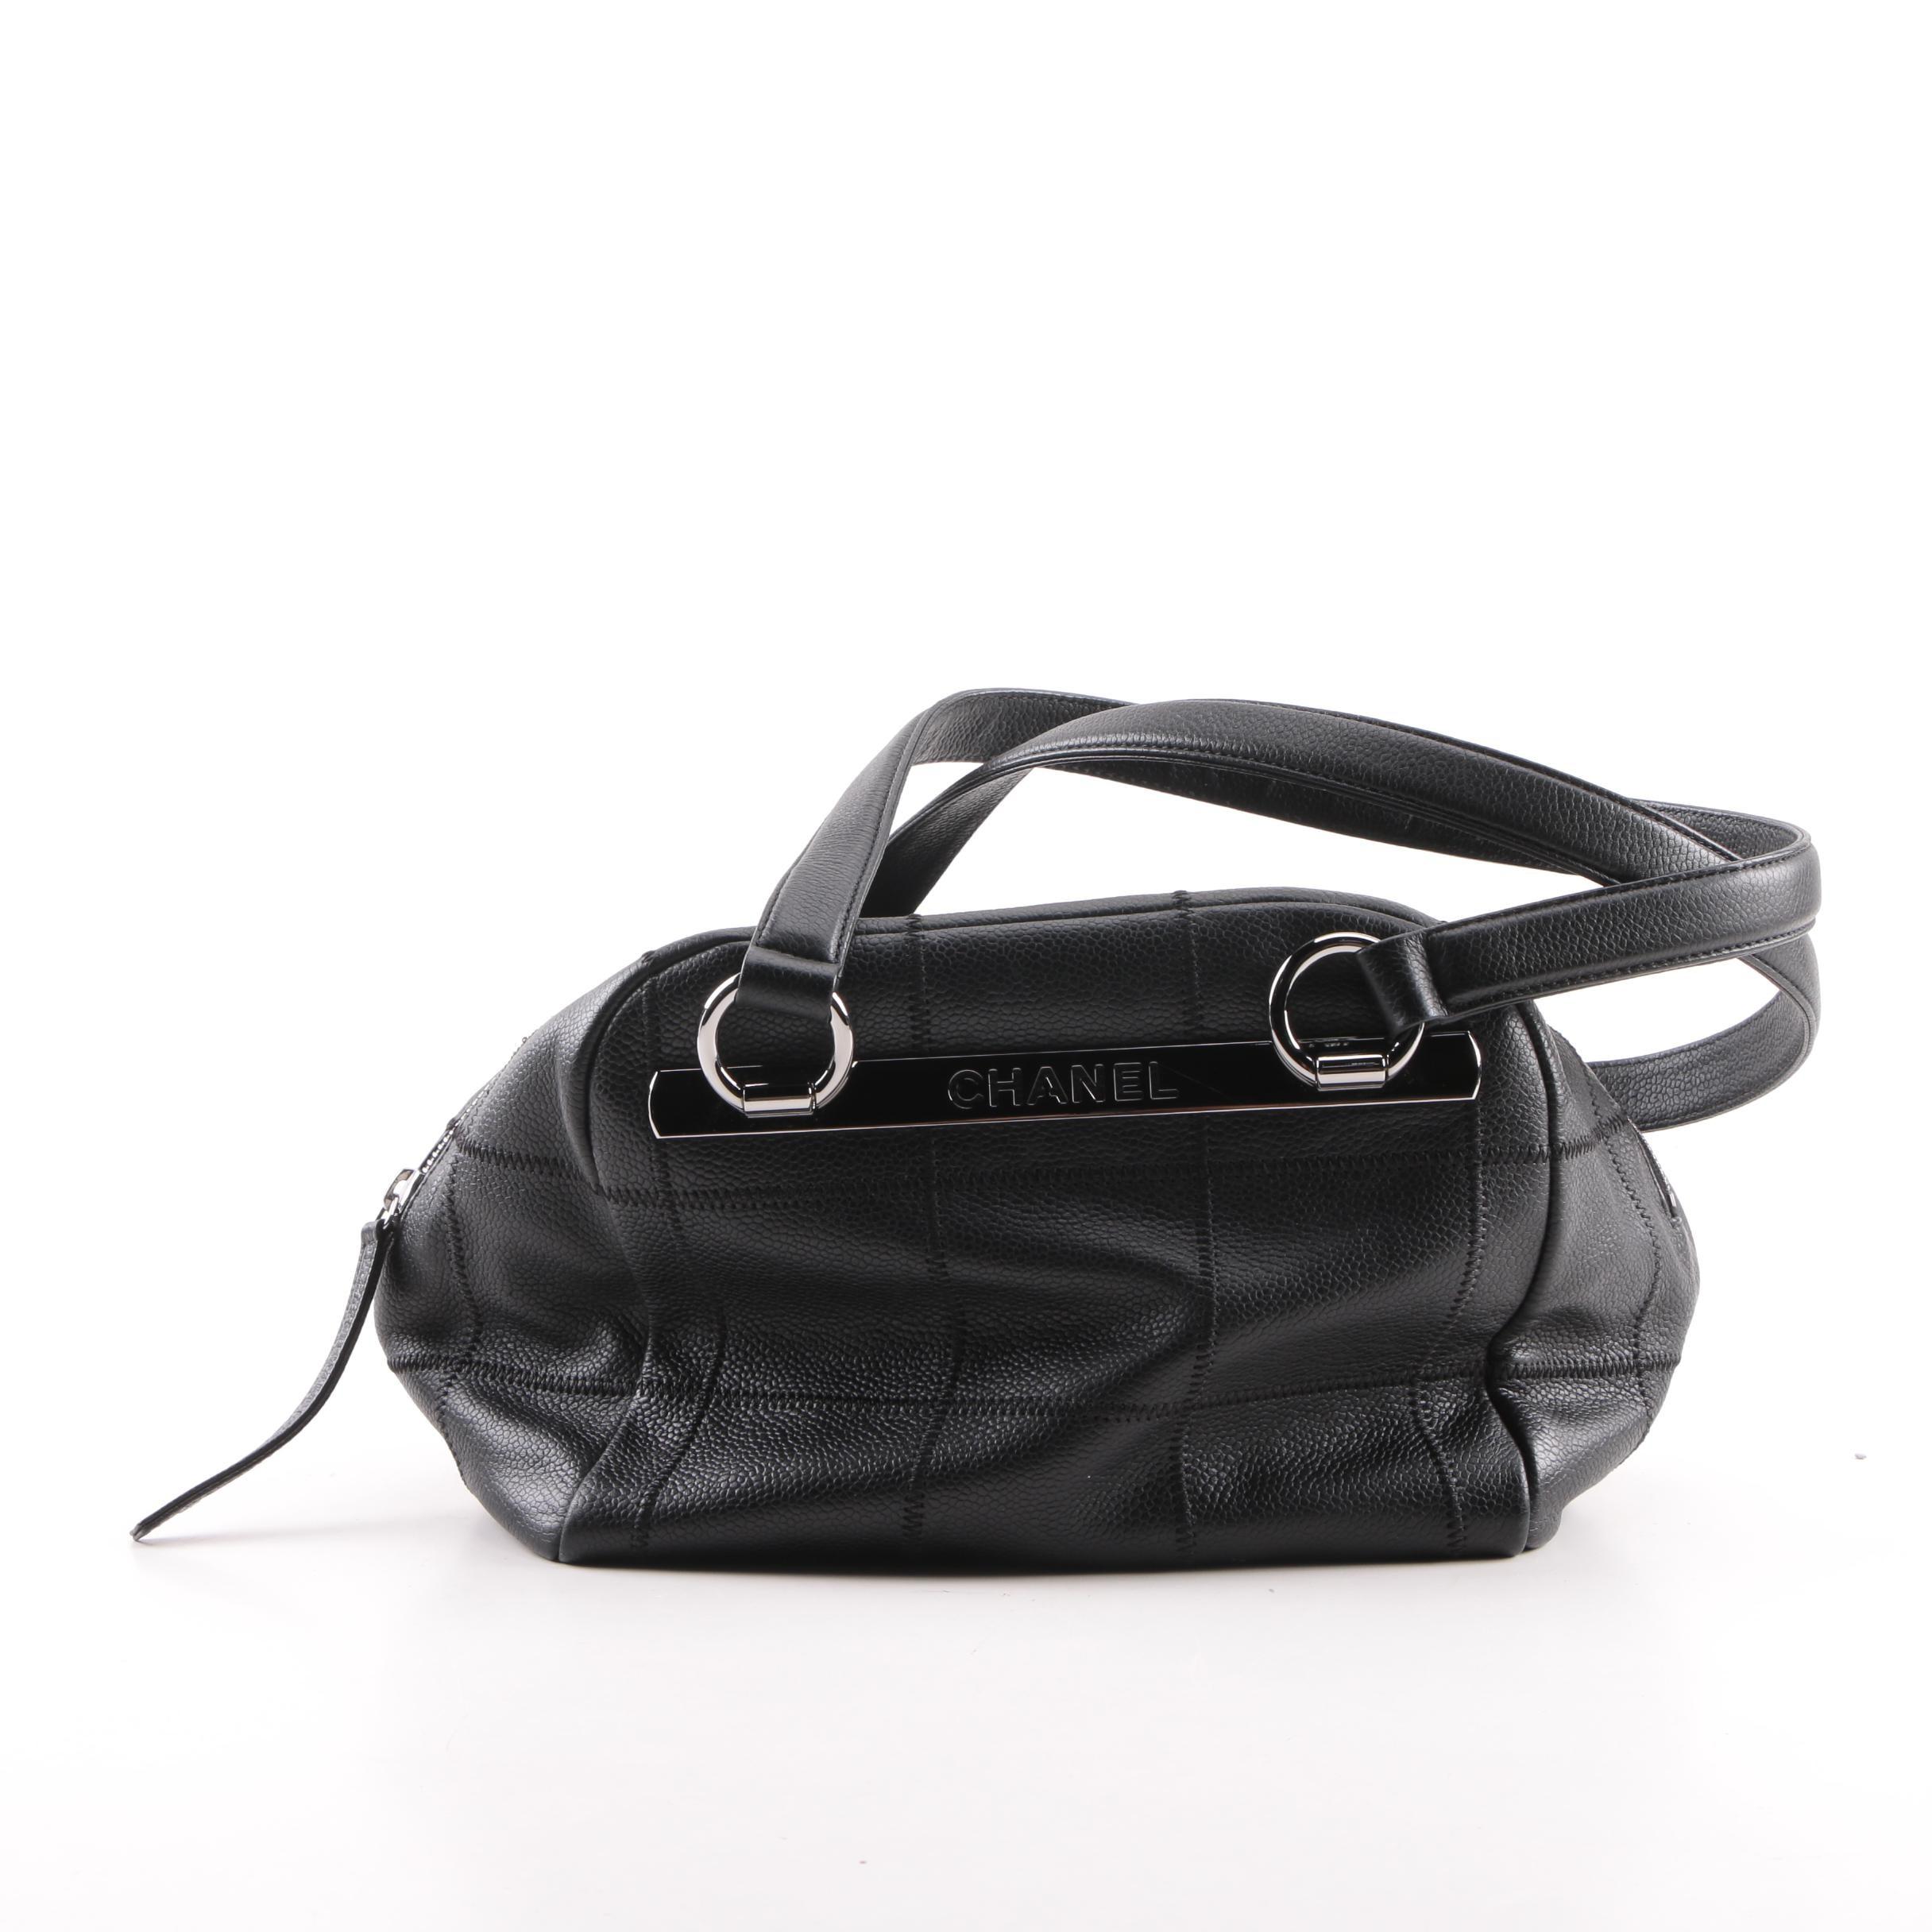 Chanel Black Leather Satchel